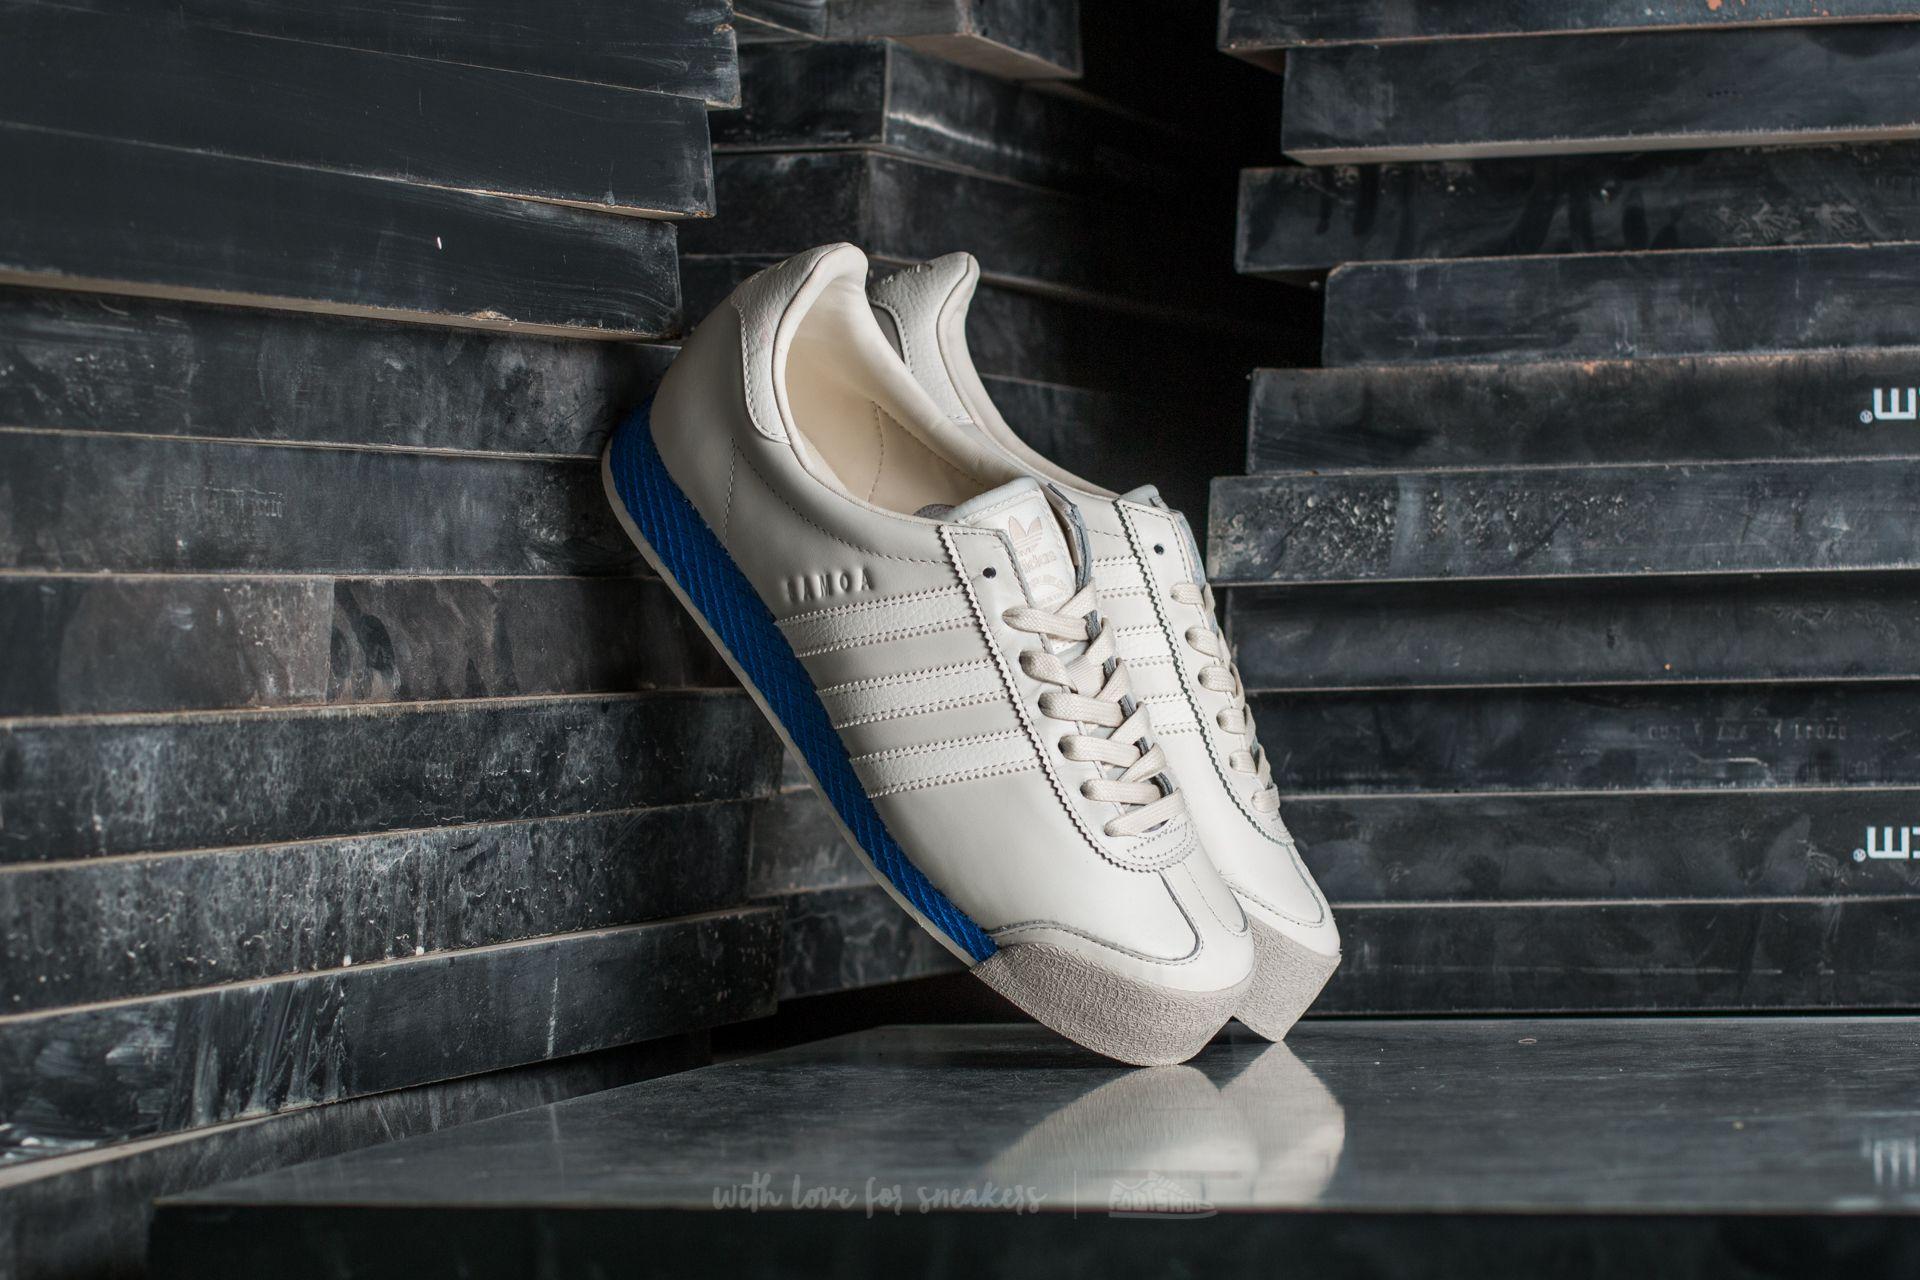 adidas samoa blue and white Online